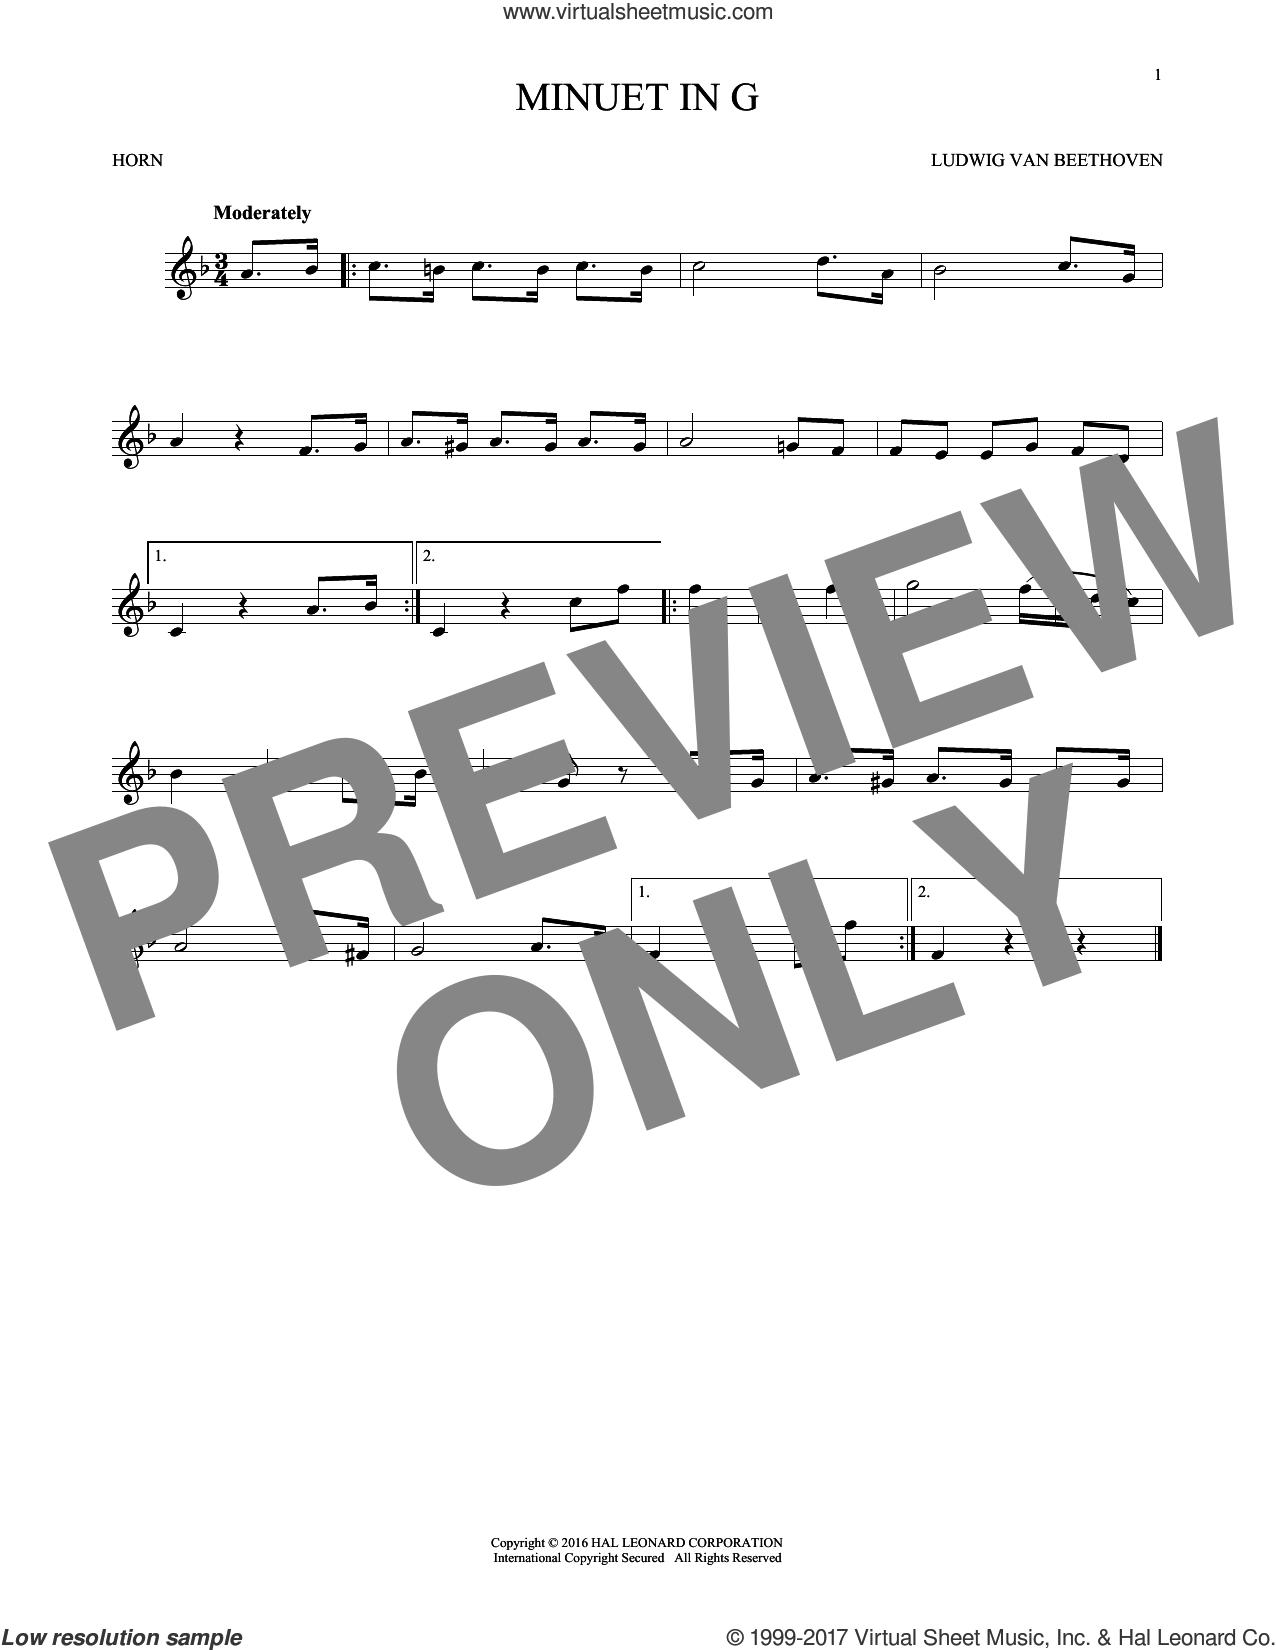 Minuet In G sheet music for horn solo by Johann Sebastian Bach, classical score, intermediate skill level